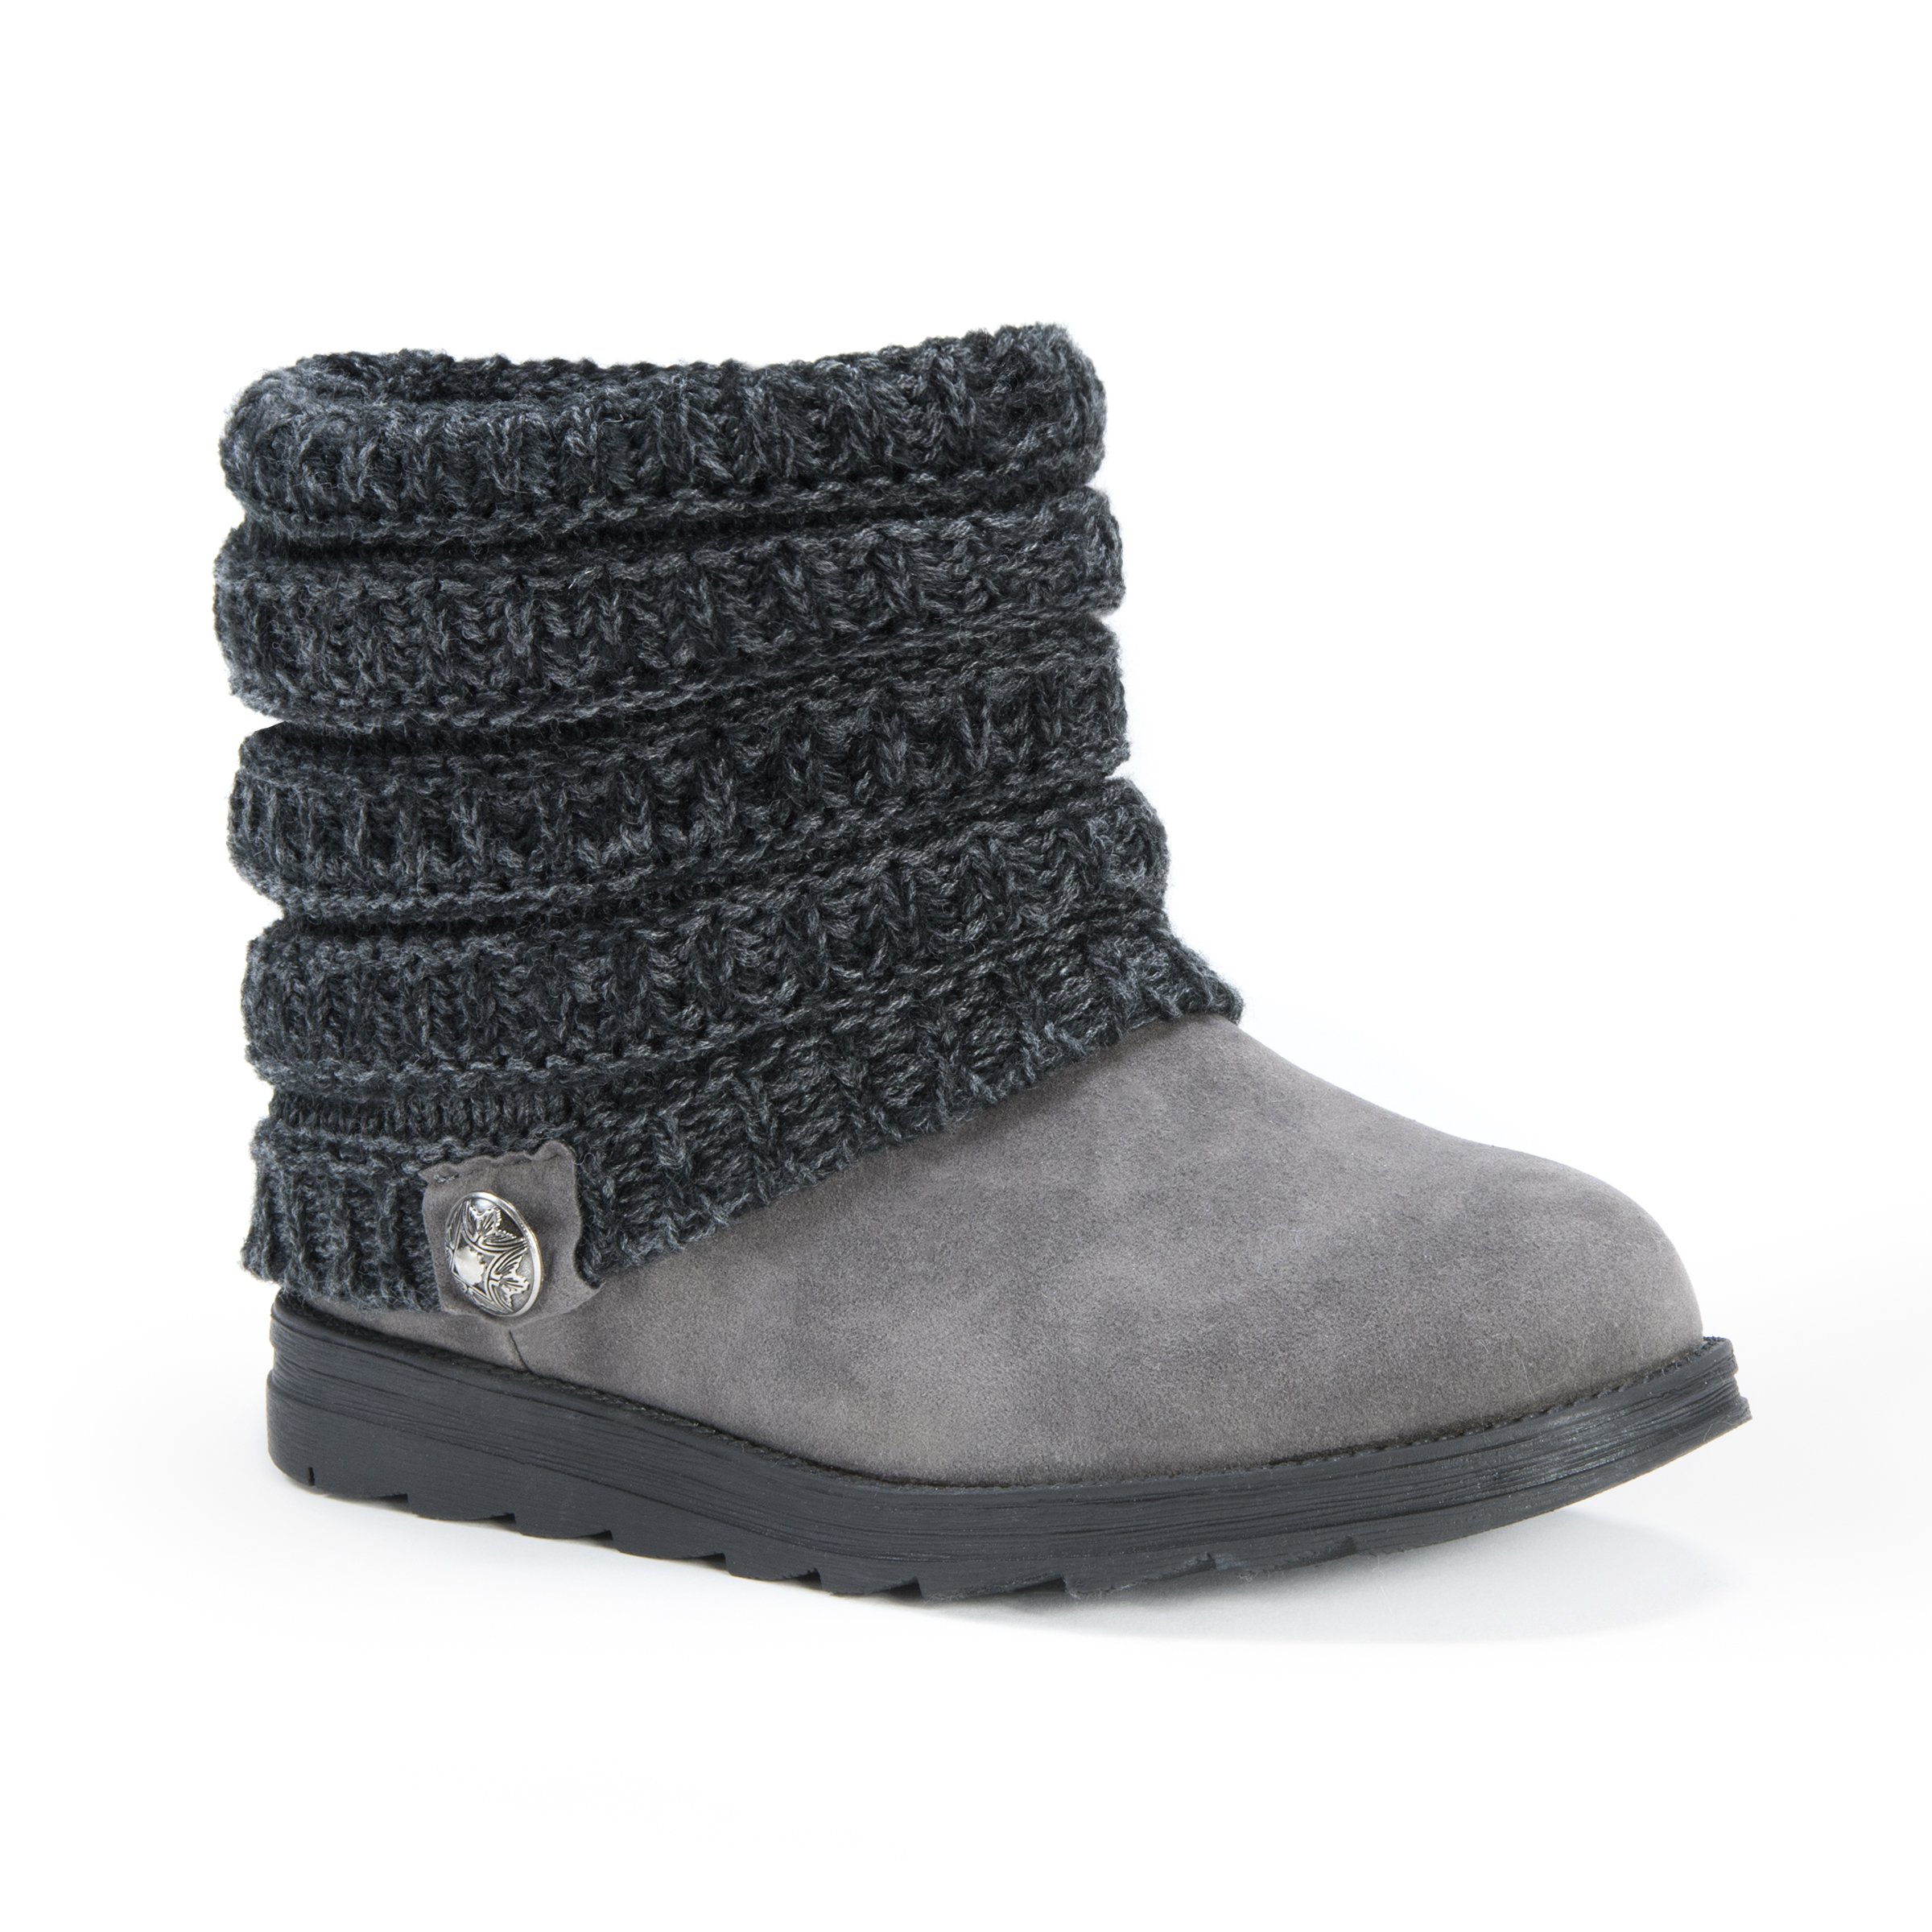 de44b1c99509 MUK LUKS Women s Patti Boot Ankle Bootie